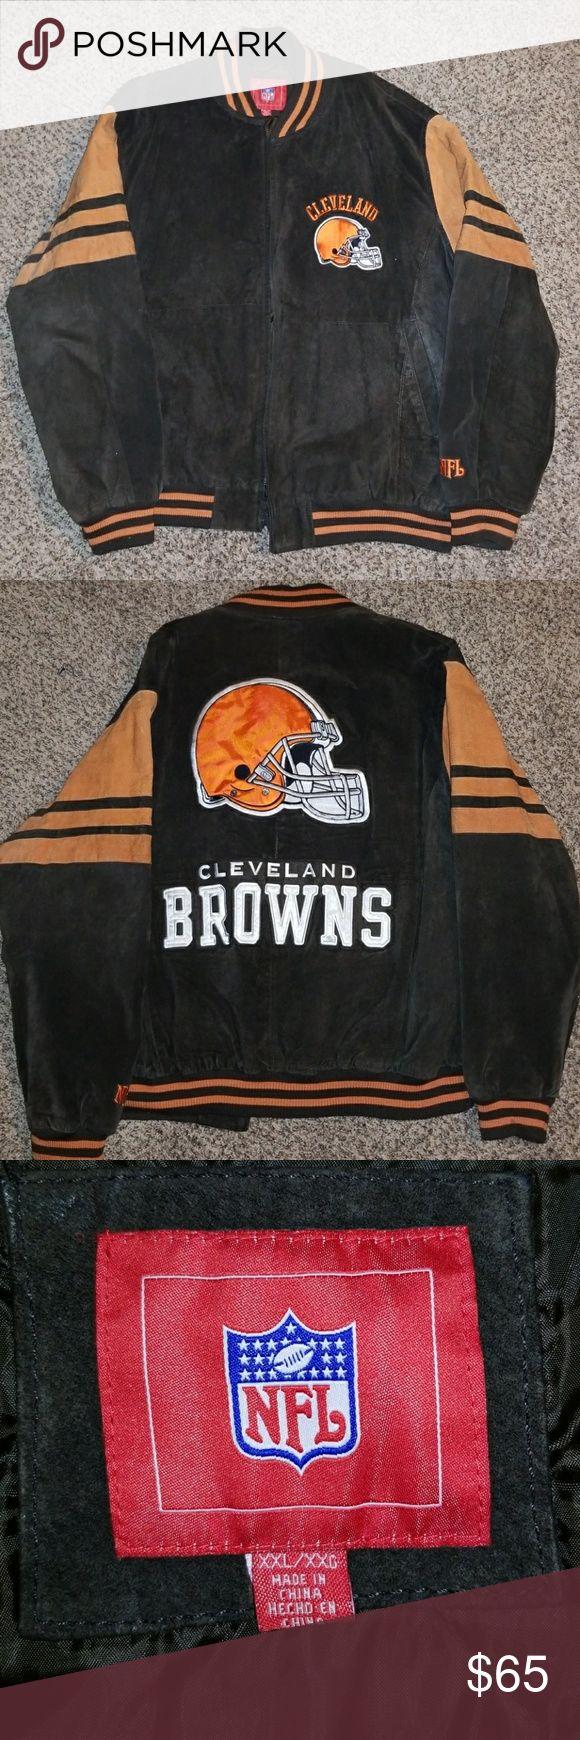 NFL Cleveland Browns Vintage Suede/Leather Jacket NFL Cleveland Browns Vintage Suede/Leather Jacket Size XXL NFL Jackets & Coats Bomber & Varsity